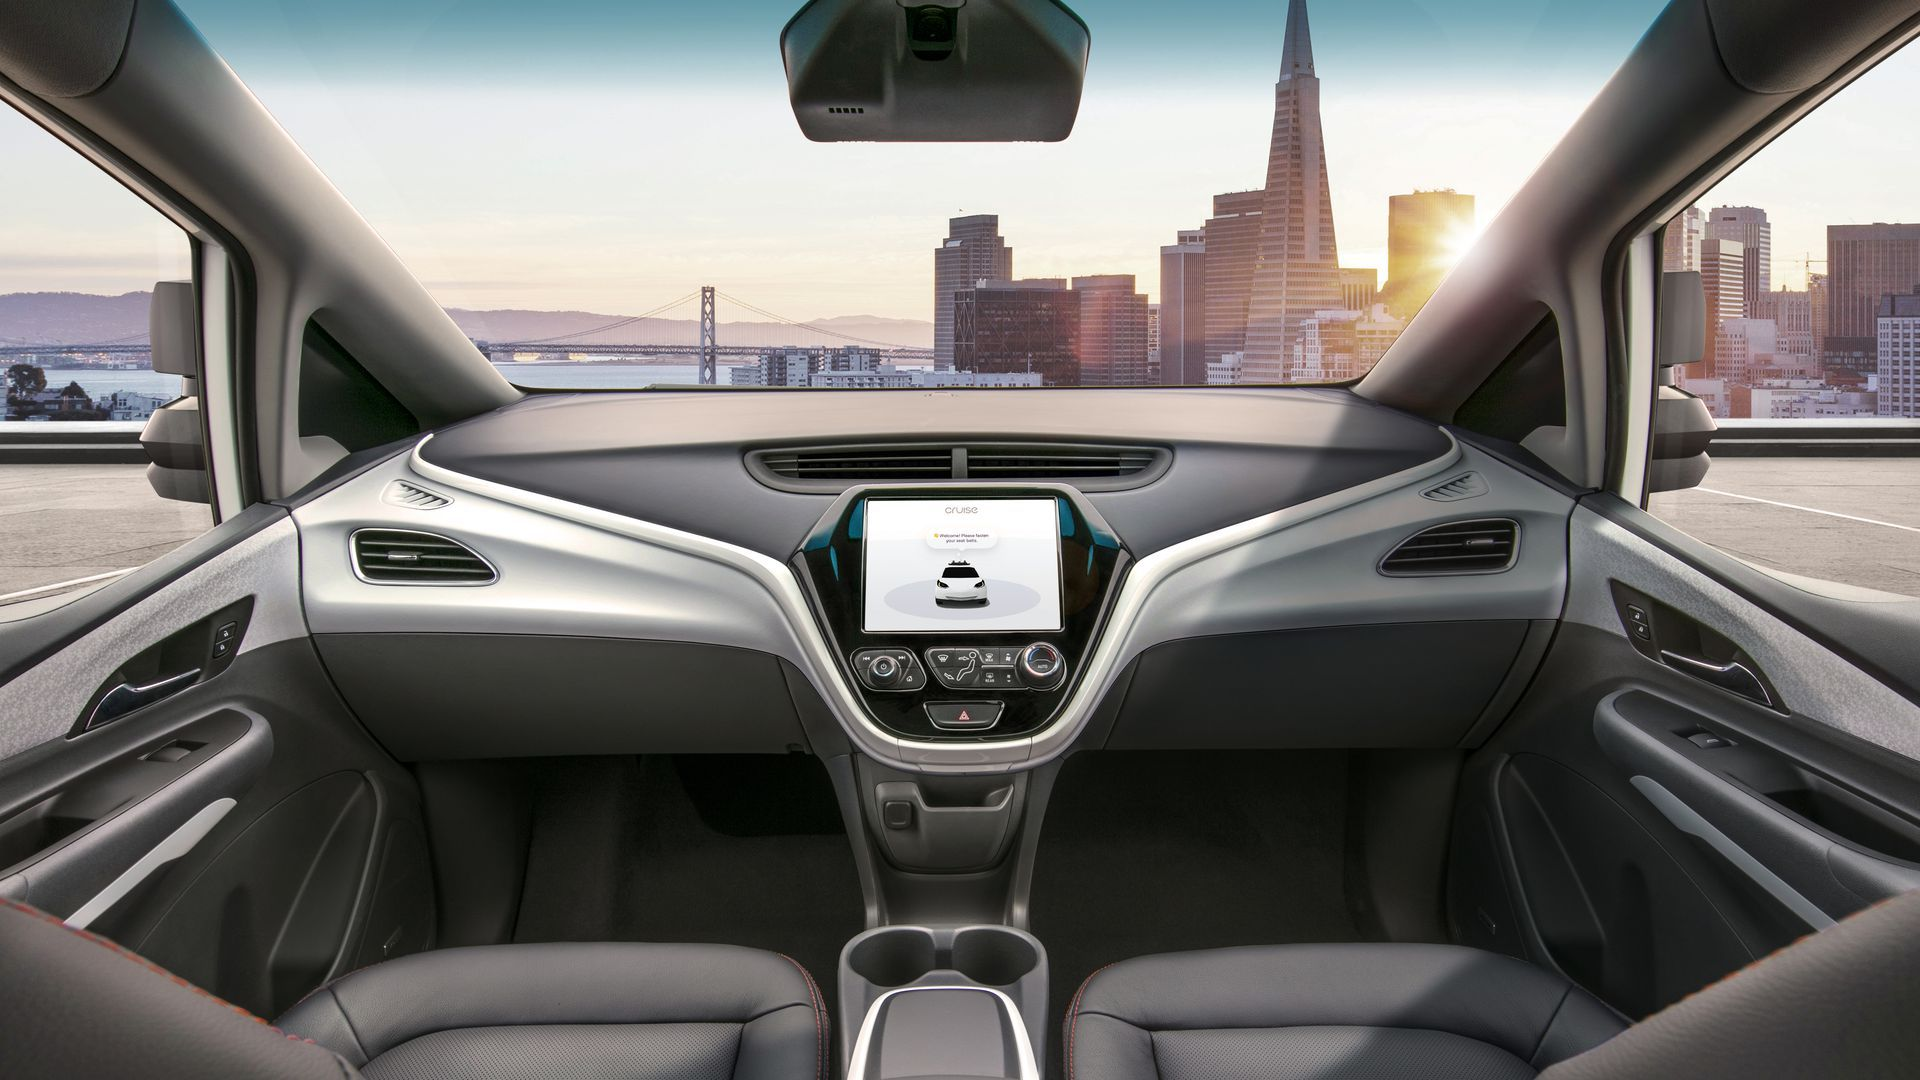 Autonomous vehicle interior